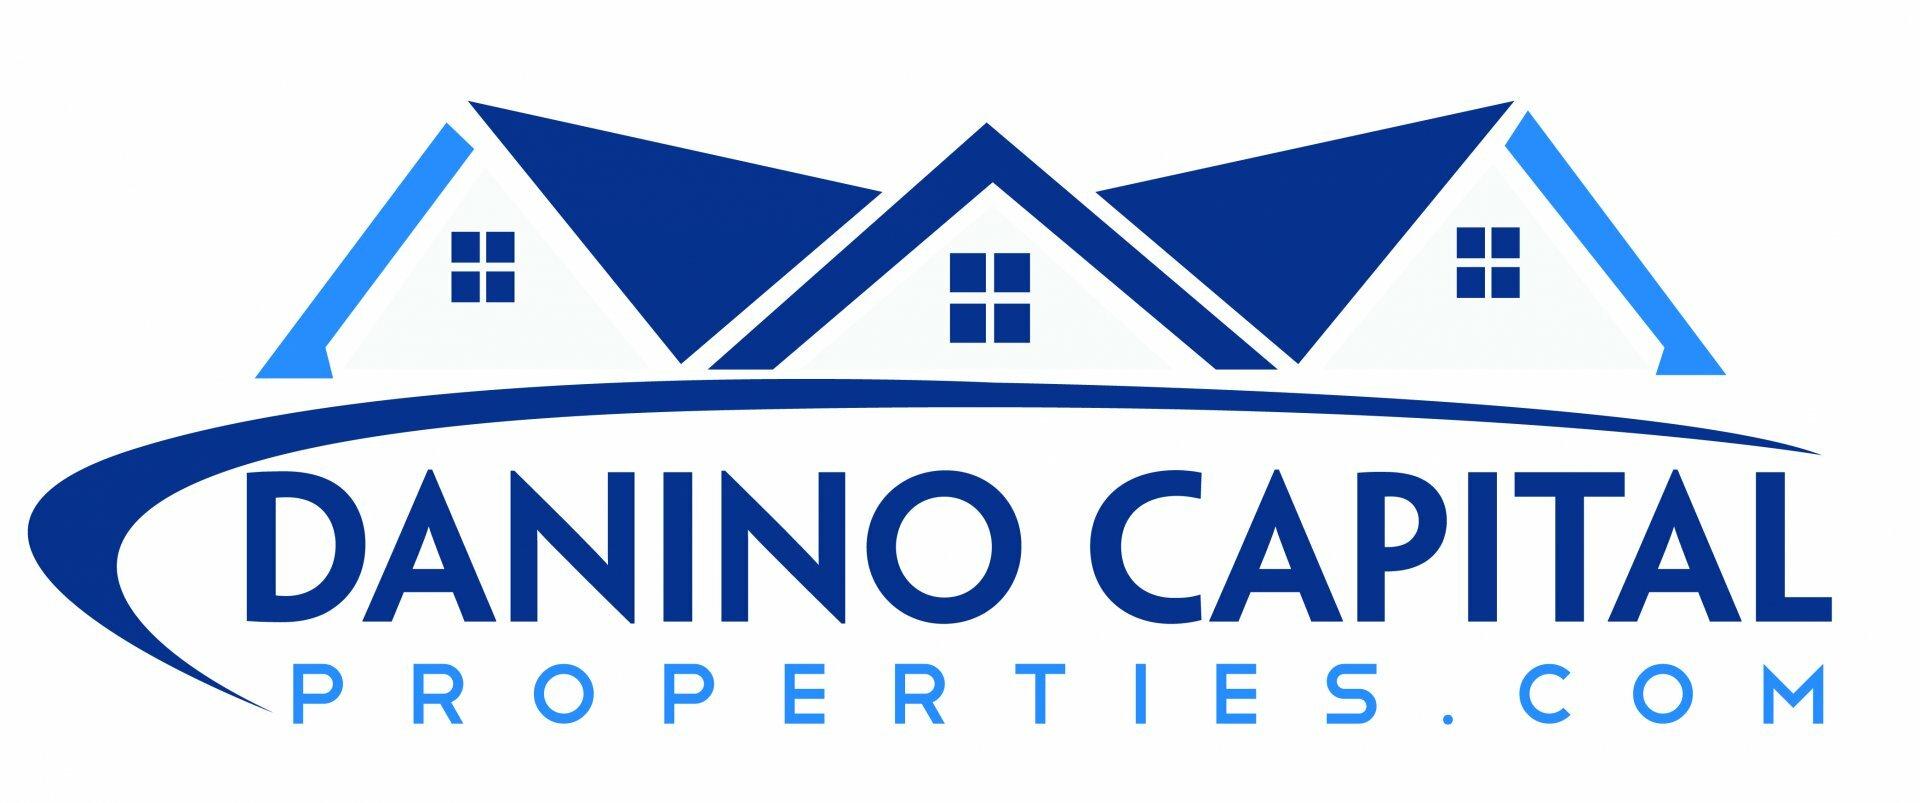 Danino Capital Properties logo